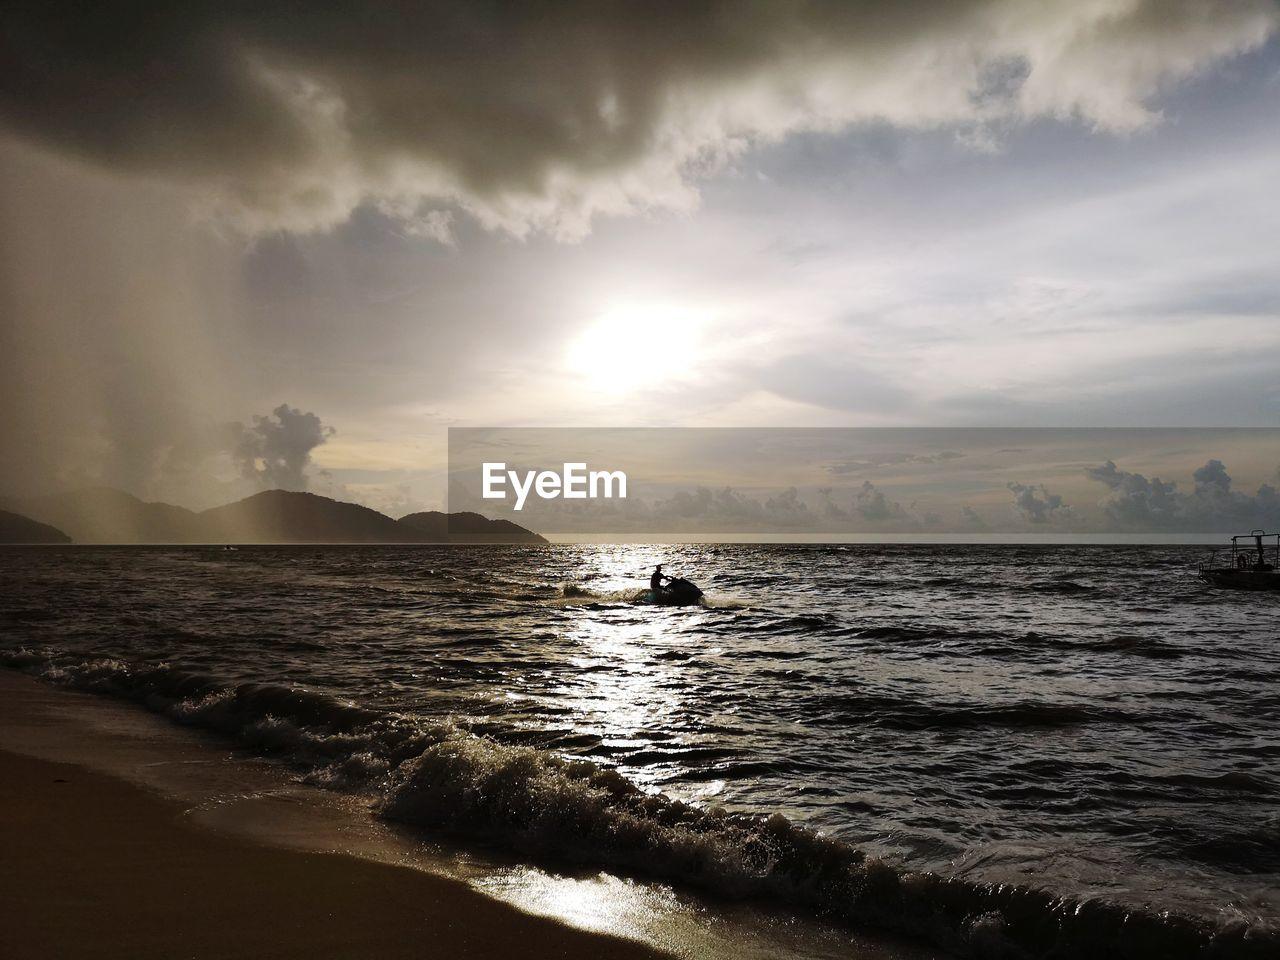 sea, water, sky, cloud - sky, beach, scenics - nature, beauty in nature, land, sunset, horizon, tranquility, nature, horizon over water, tranquil scene, wave, motion, outdoors, no people, idyllic